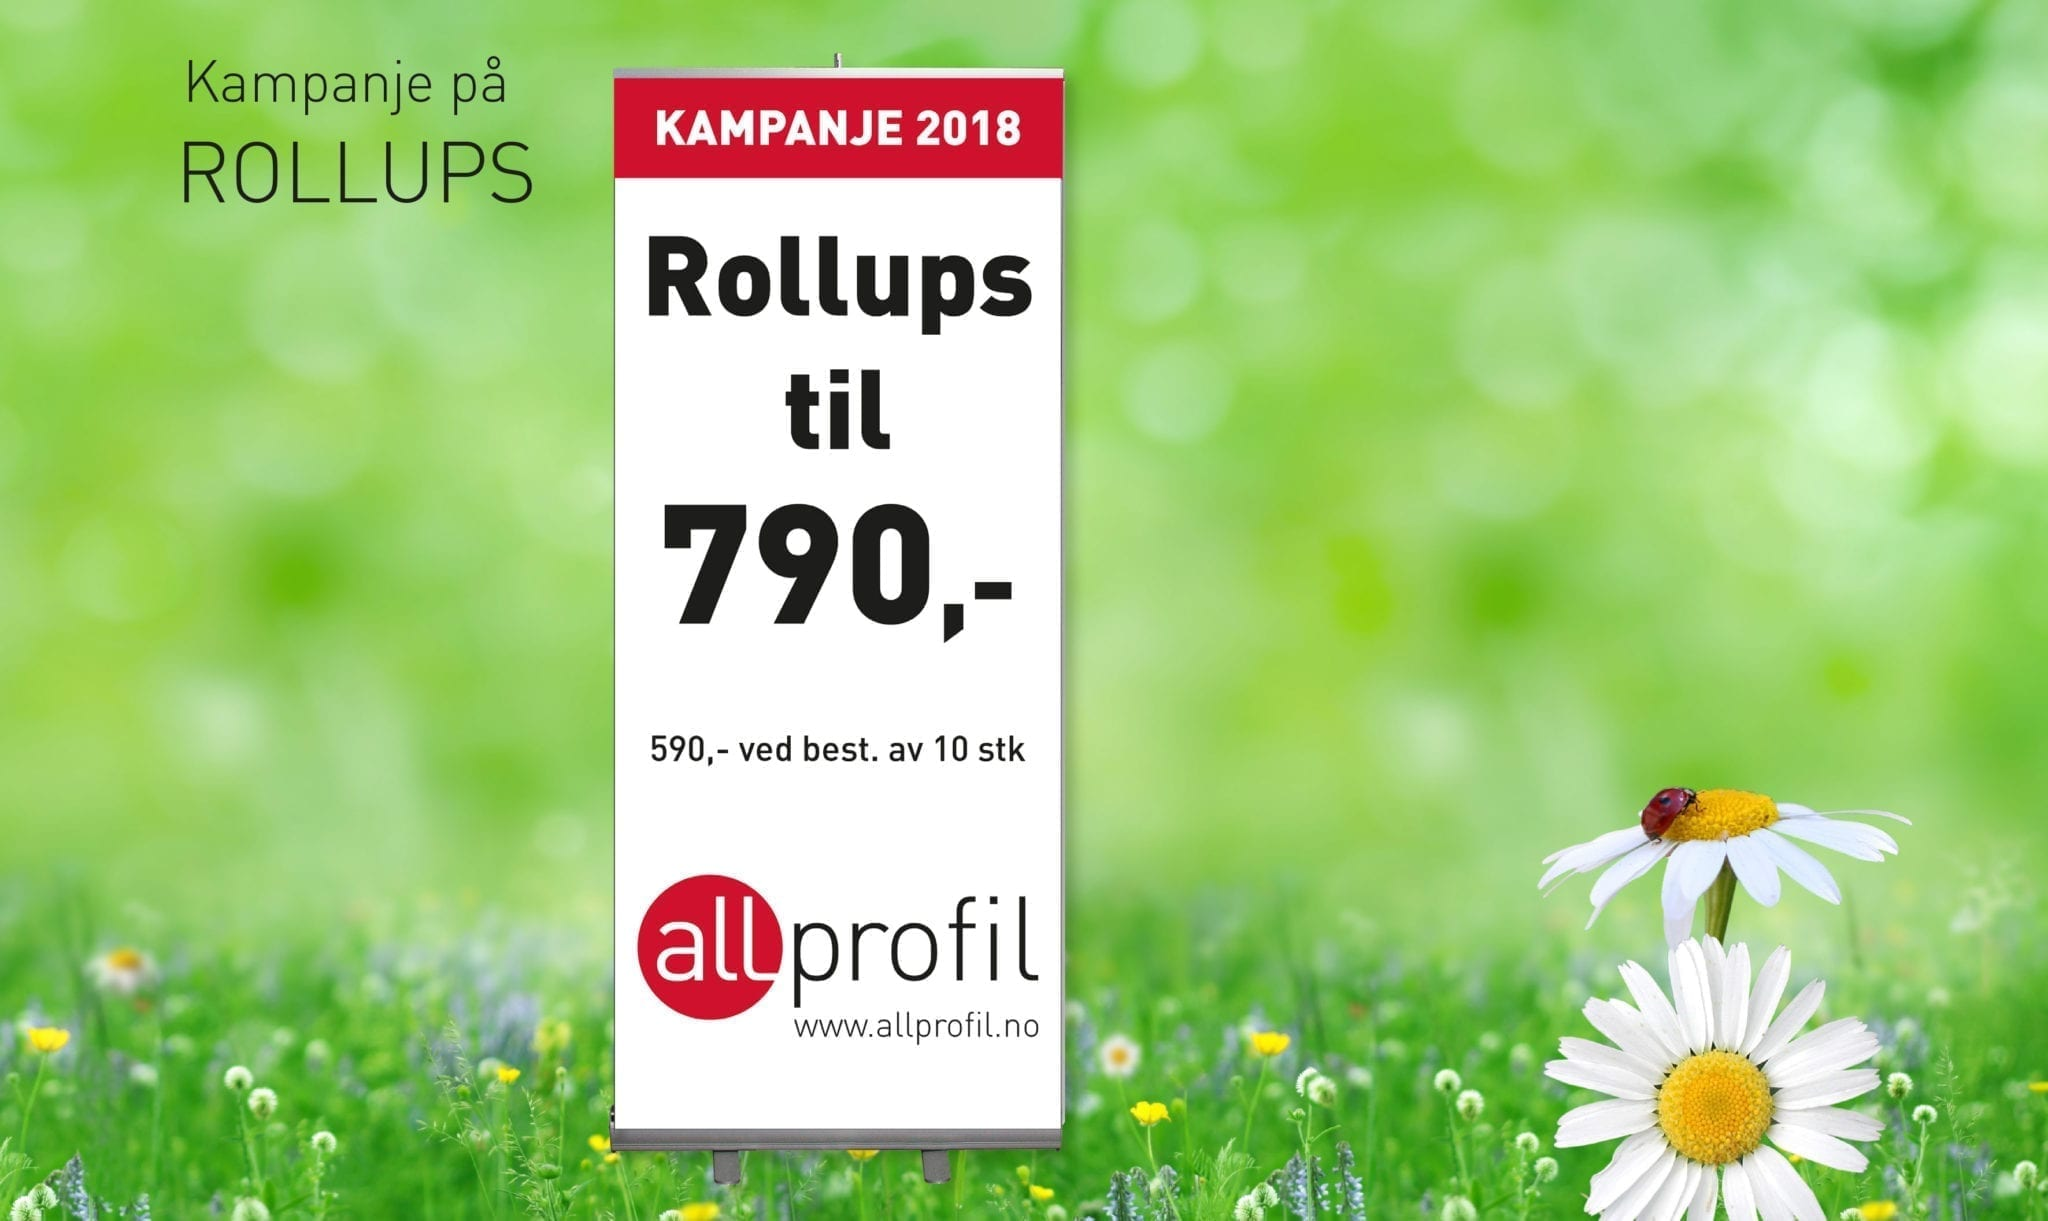 Bilde av rollup - Allprofil AS - Trykksaker - Profilering - Klær - Digital skilting - Tjenester - Kontakt